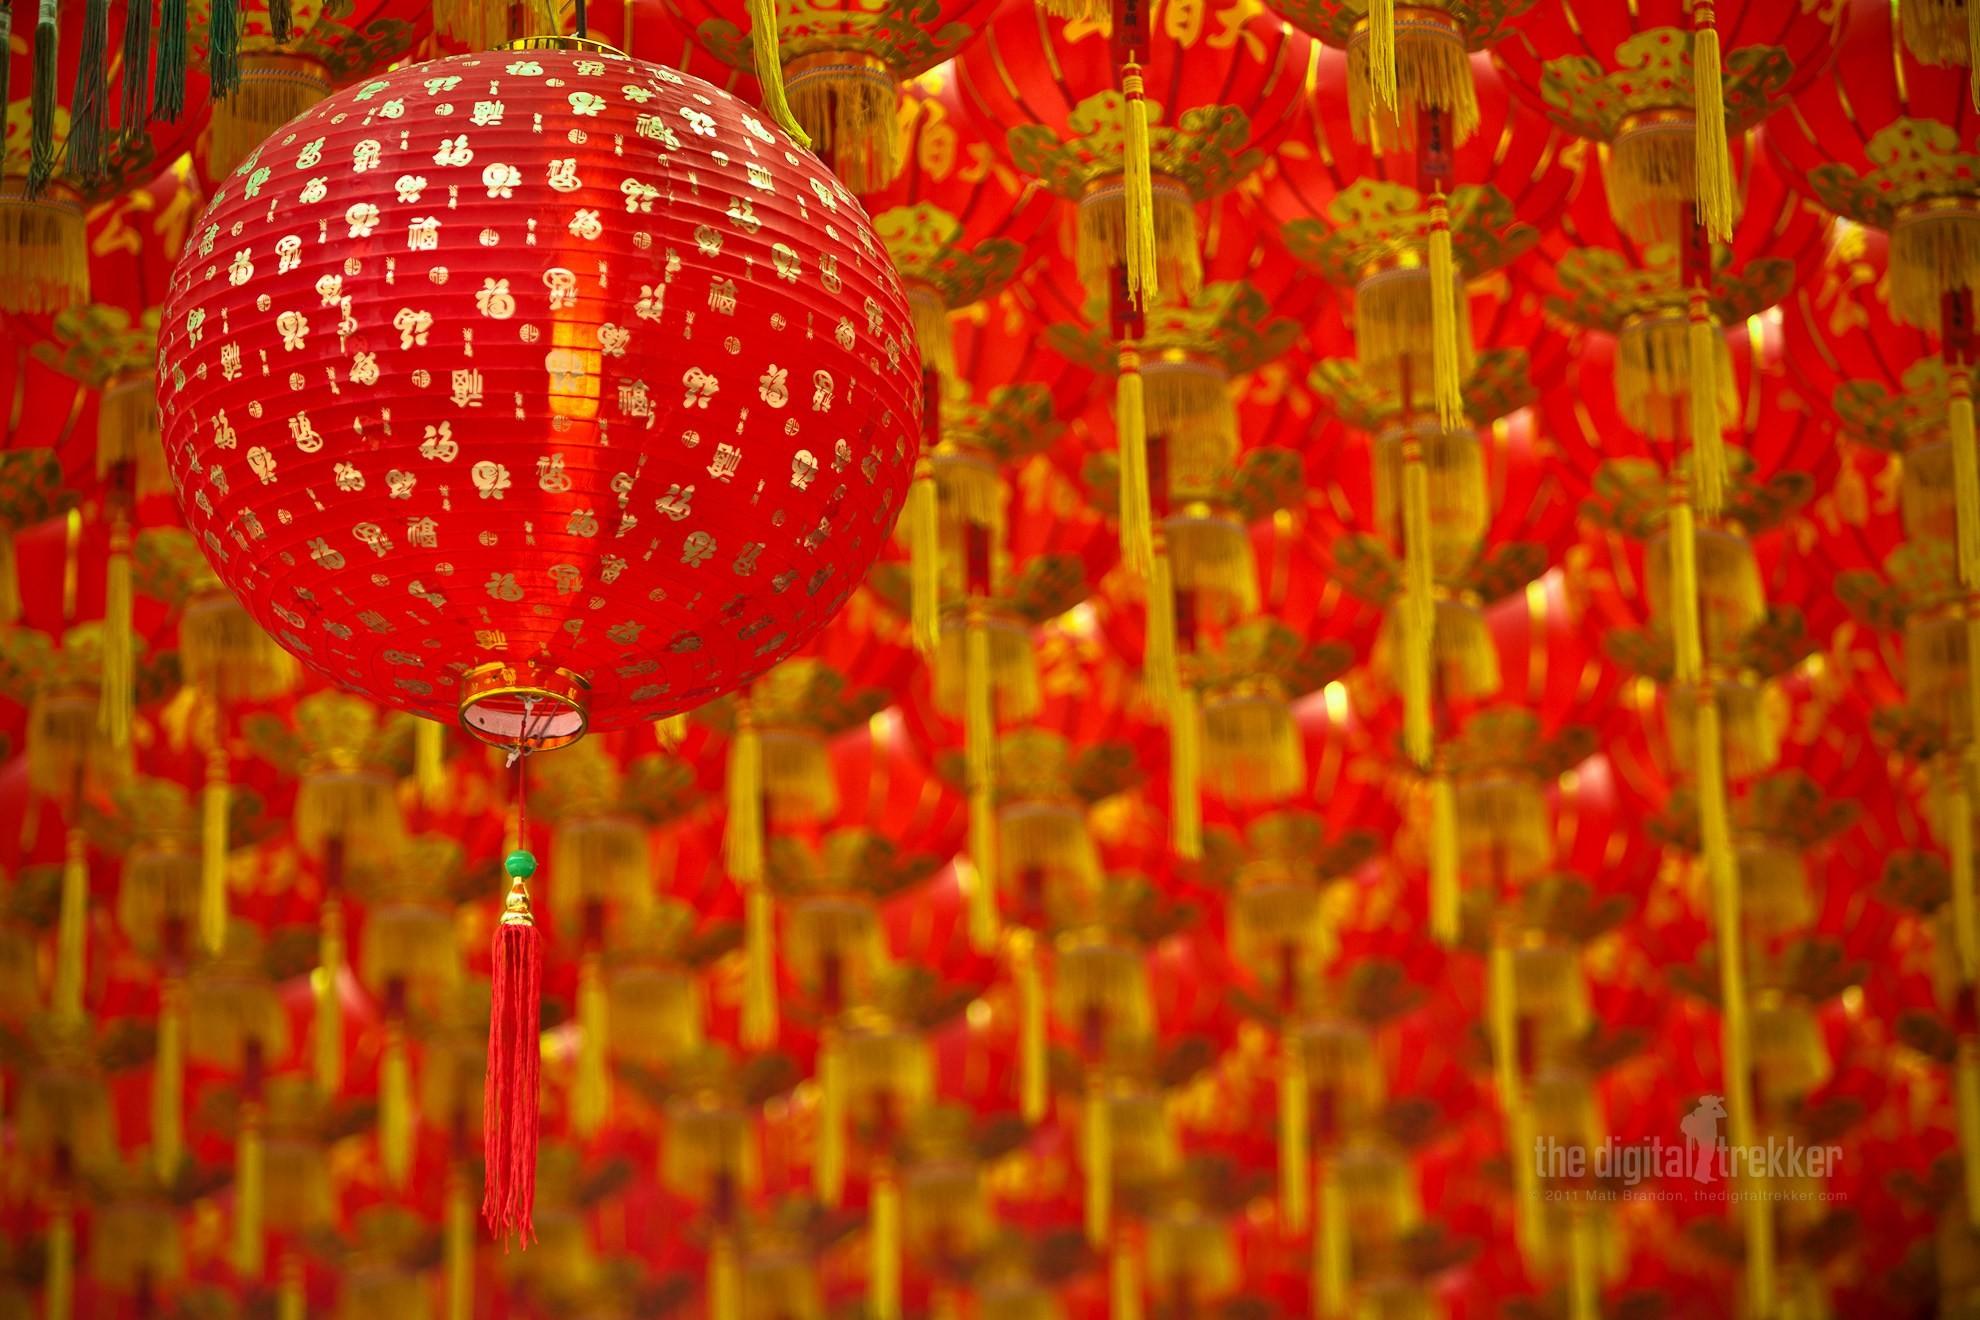 Wallpaper: February '11 – Happy Chinese New Year!